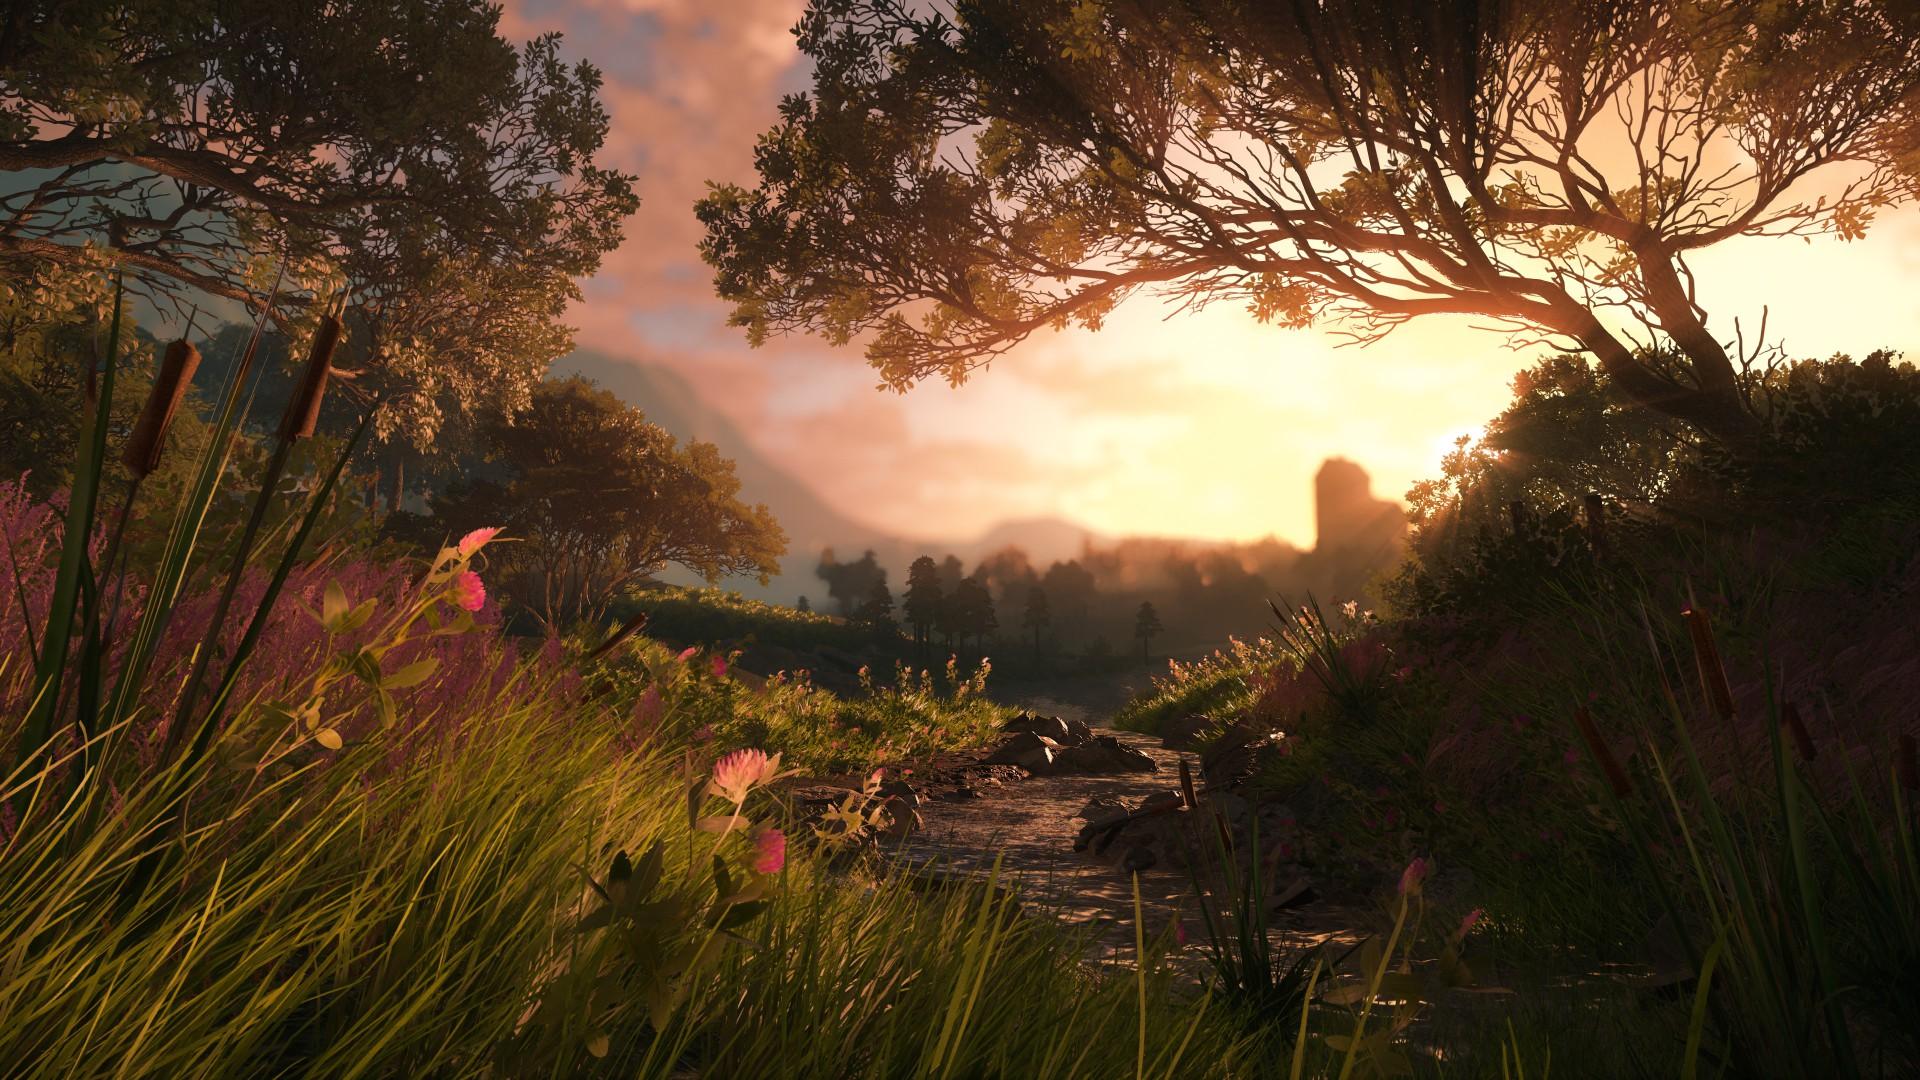 Pubg Wallpaper Landscape: 《独行者:试验场》开发商:当前吃鸡缺乏战术_www.3dmgame.com